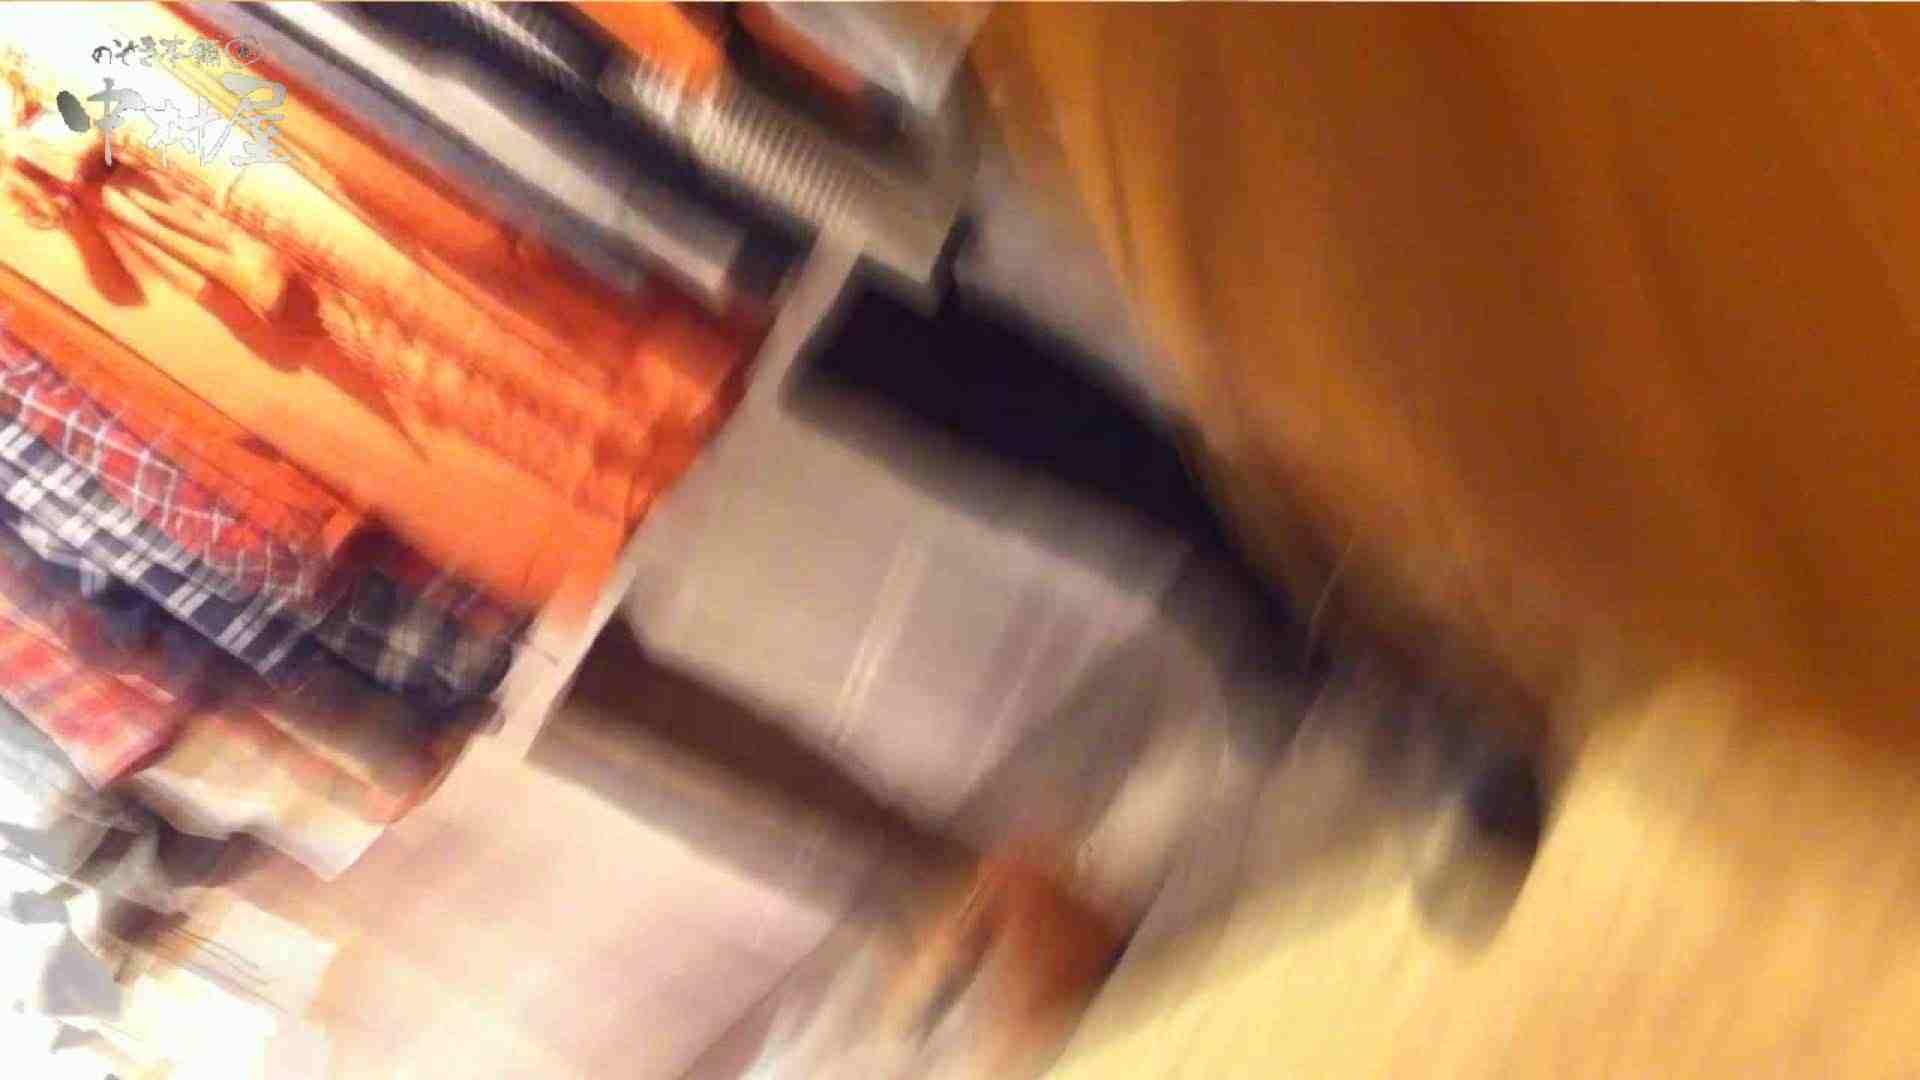 vol.84 美人アパレル胸チラ&パンチラ 帽子オネェさんに胸元アタック! 接写  94連発 67